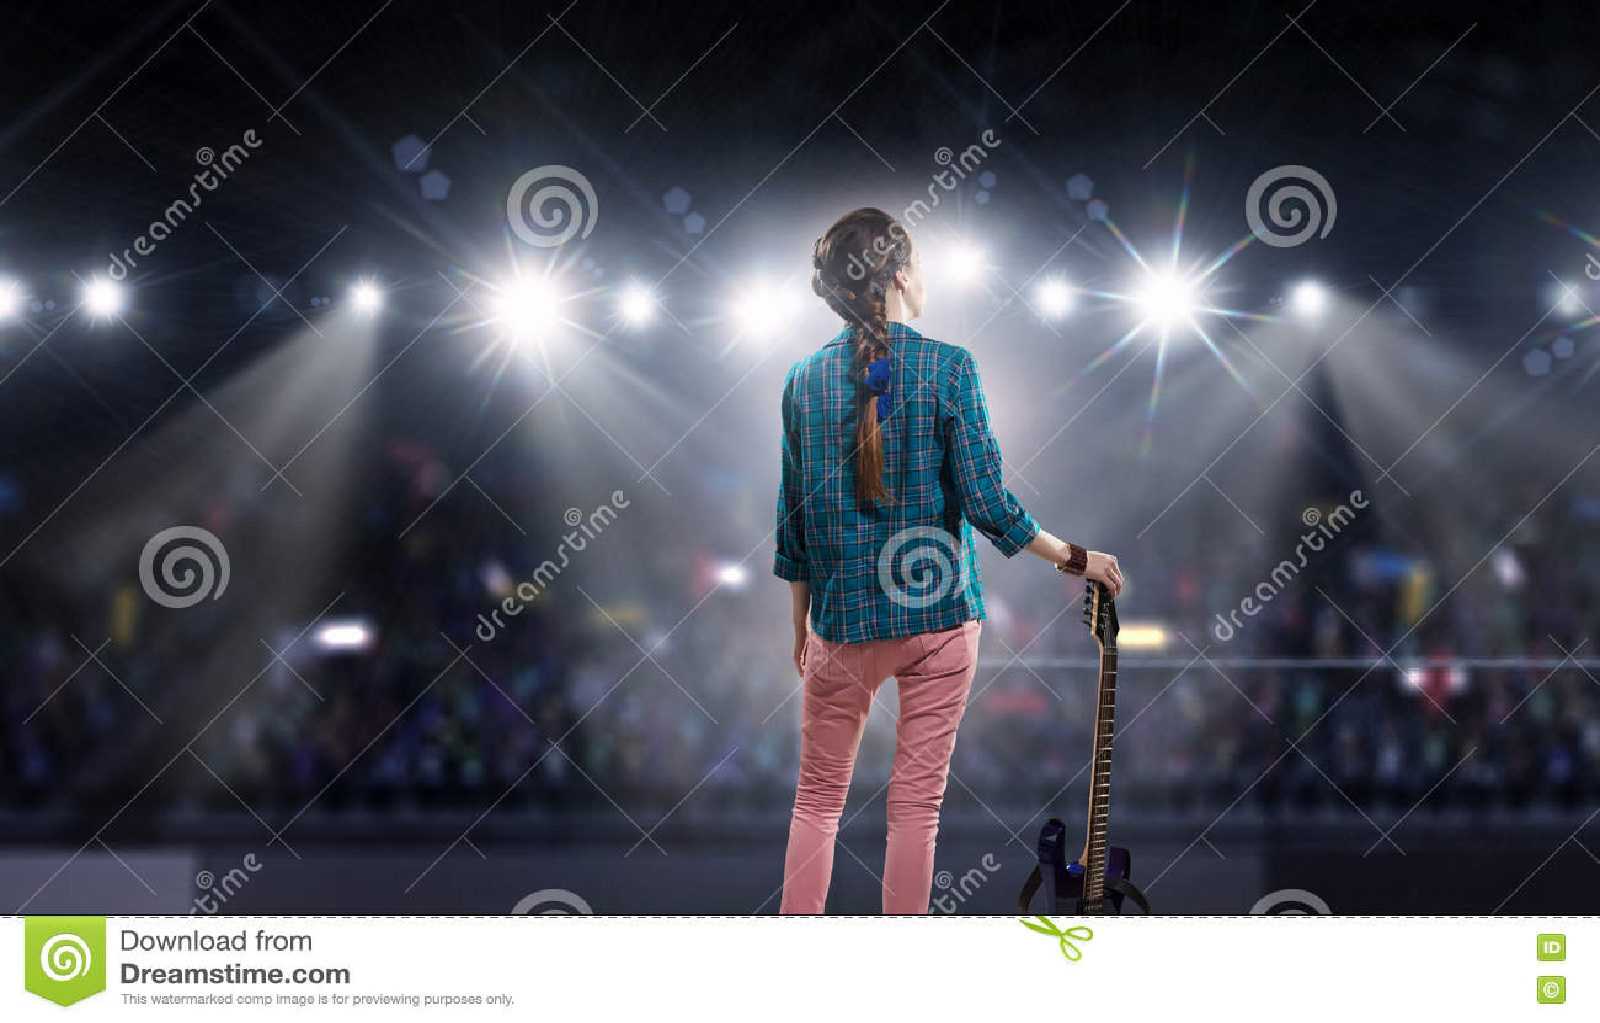 Музыкант утеса на концерте Мультимедиа